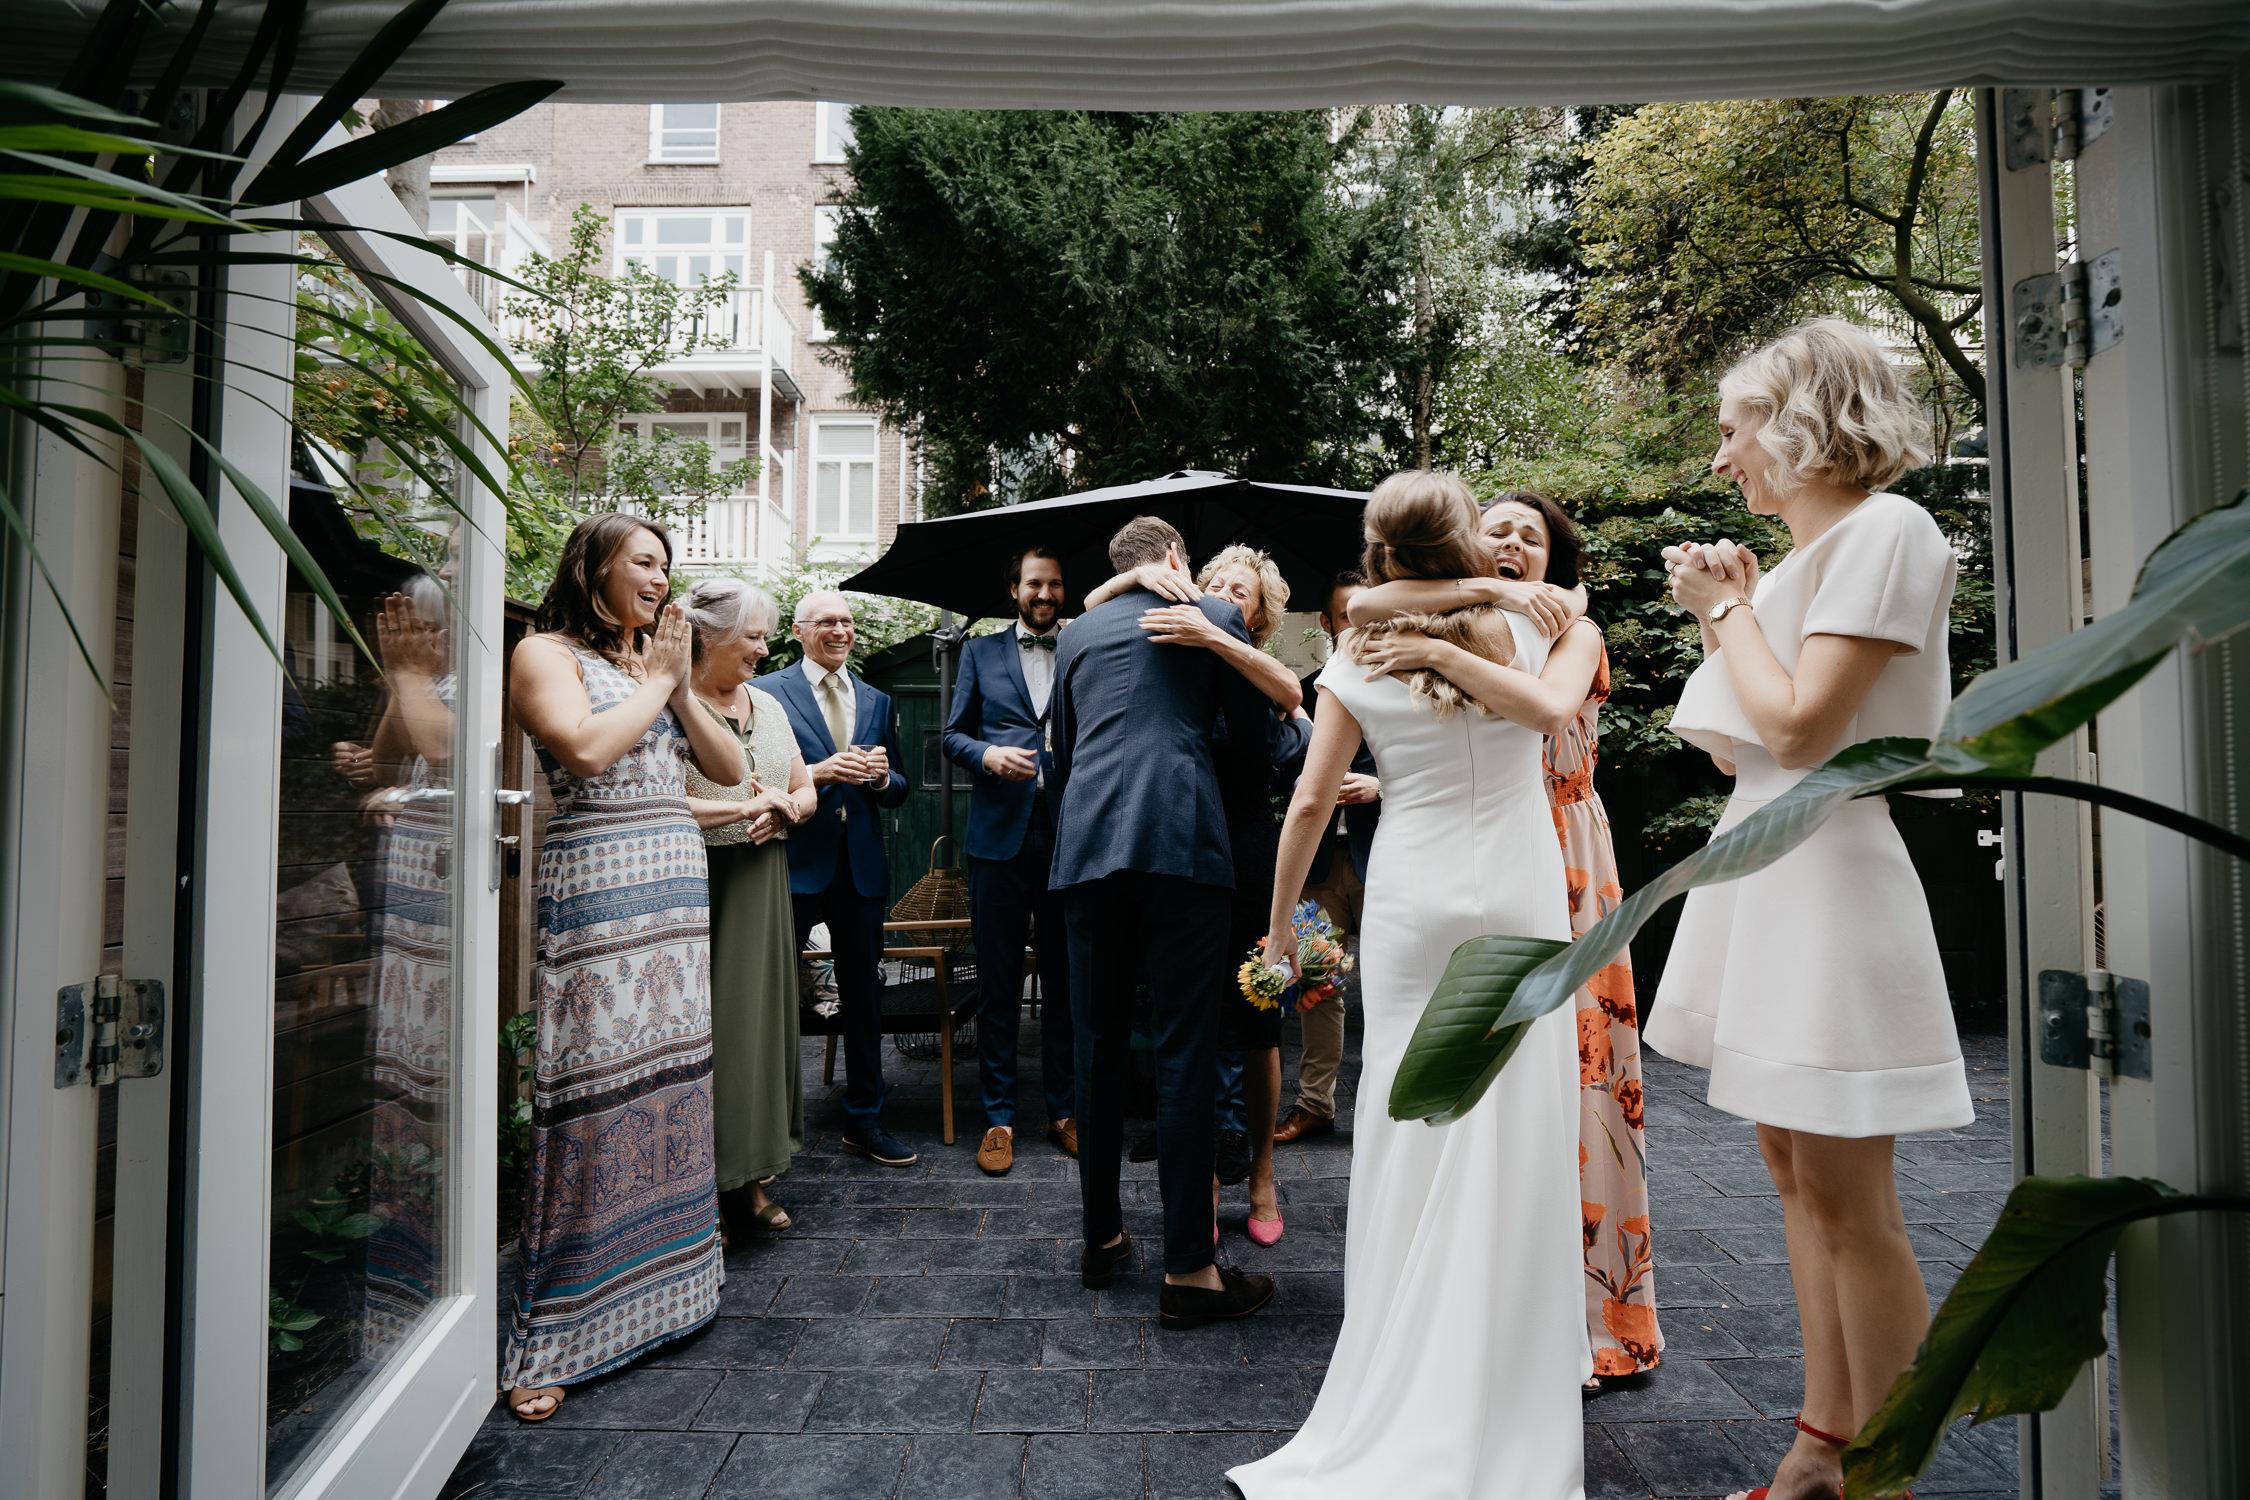 summer wedding amsterdam photography by photographer mark hadden